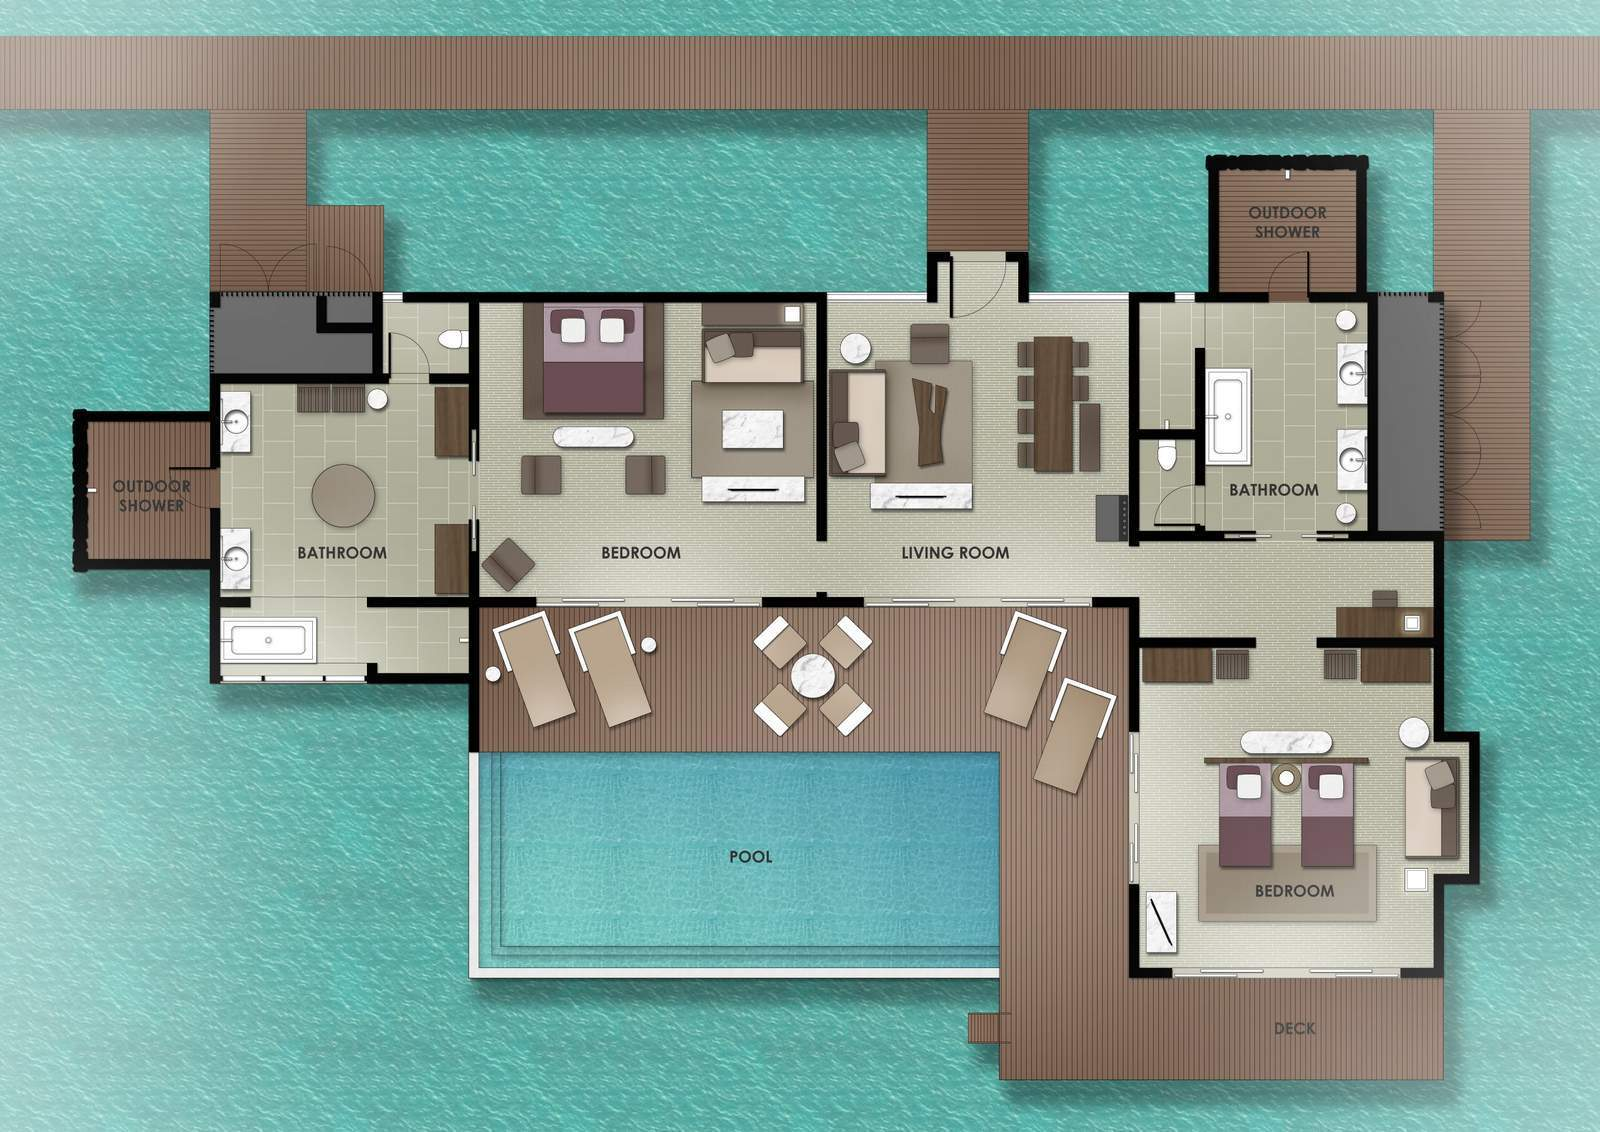 Мальдивы, отель The Residence Maldives at Dhigurah, план-схема номера Two-Bedroom Water Pool Villa